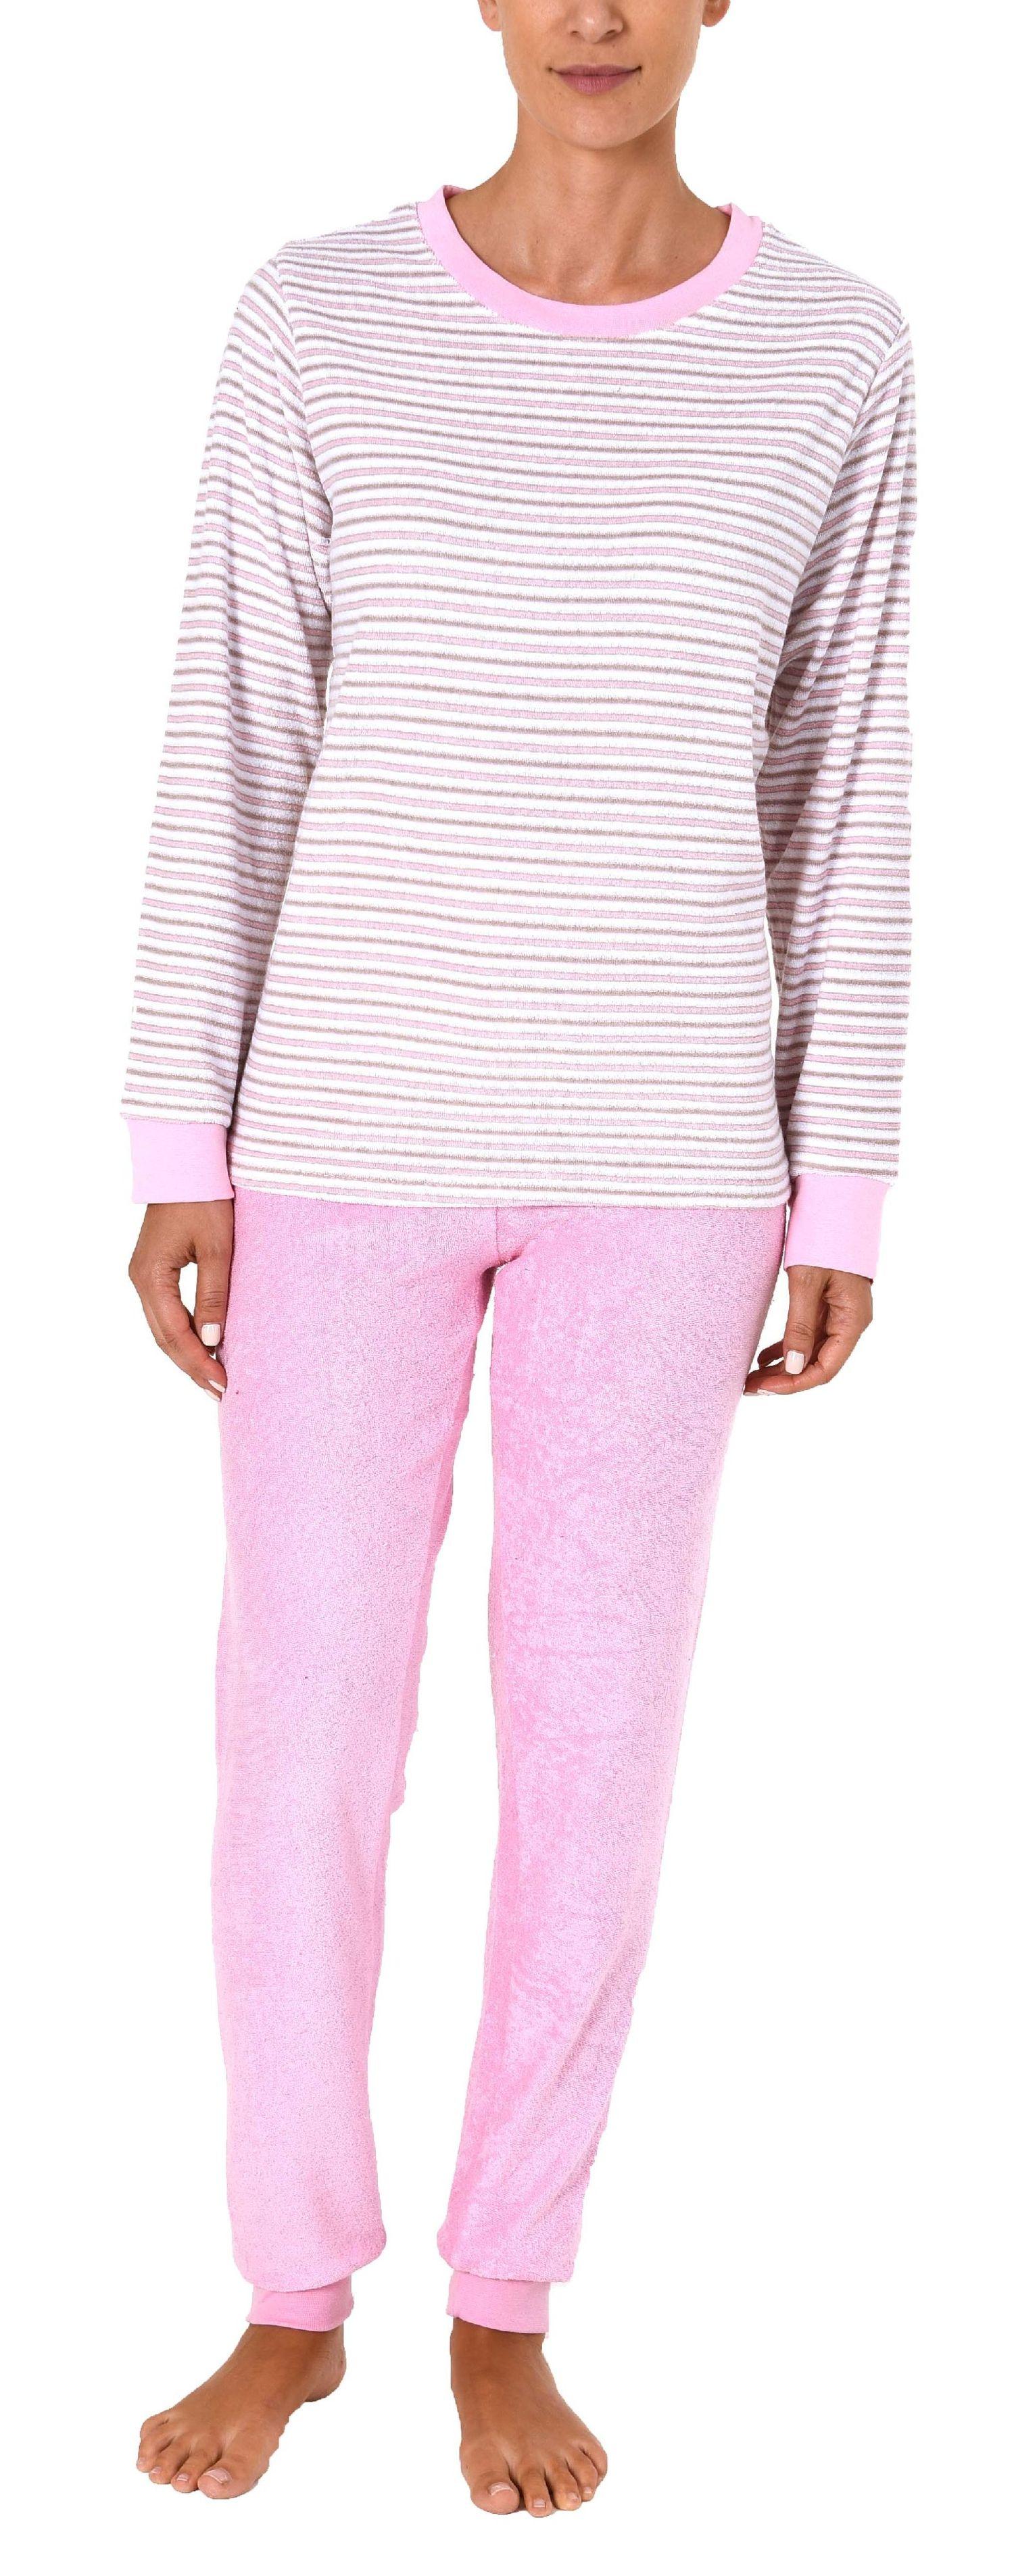 Damen Frottee Pyjama lang mit Bündchen - 61237 – Bild 2